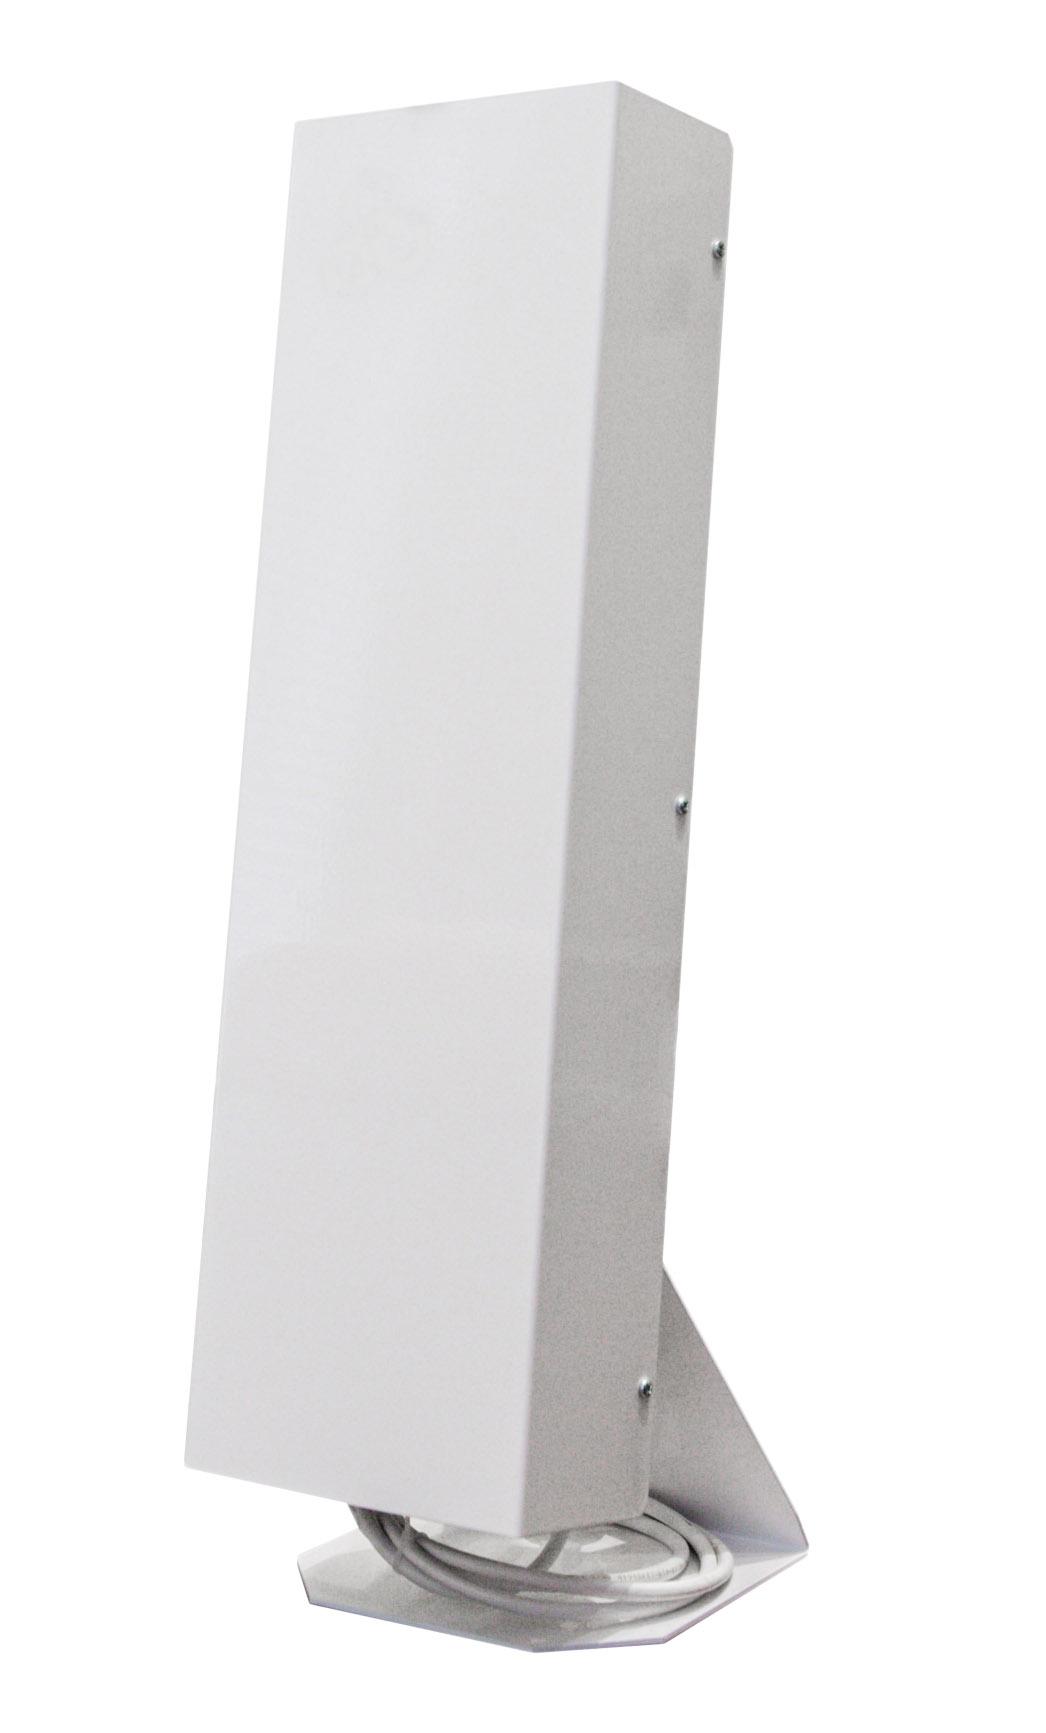 recirculator-hor-a15-30-photo-2